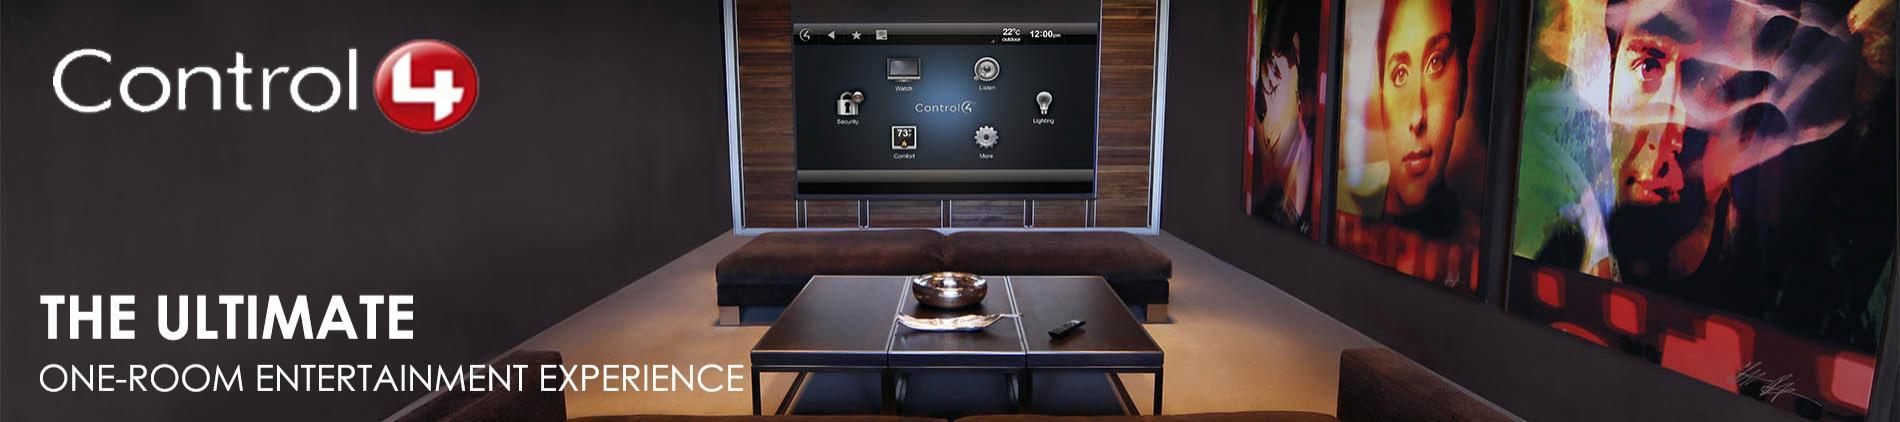 Control4, Theatre, Custom, Smart Home